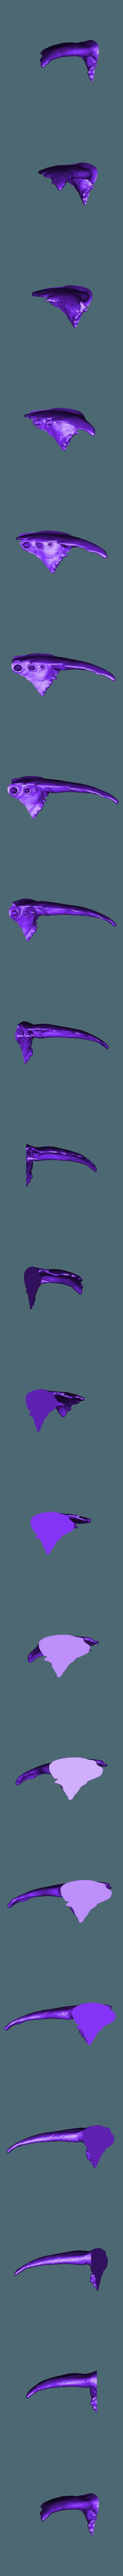 GADGETs head  pt6.stl Download free STL file GADGET the robotic Gremlin • 3D printing object, atarka3